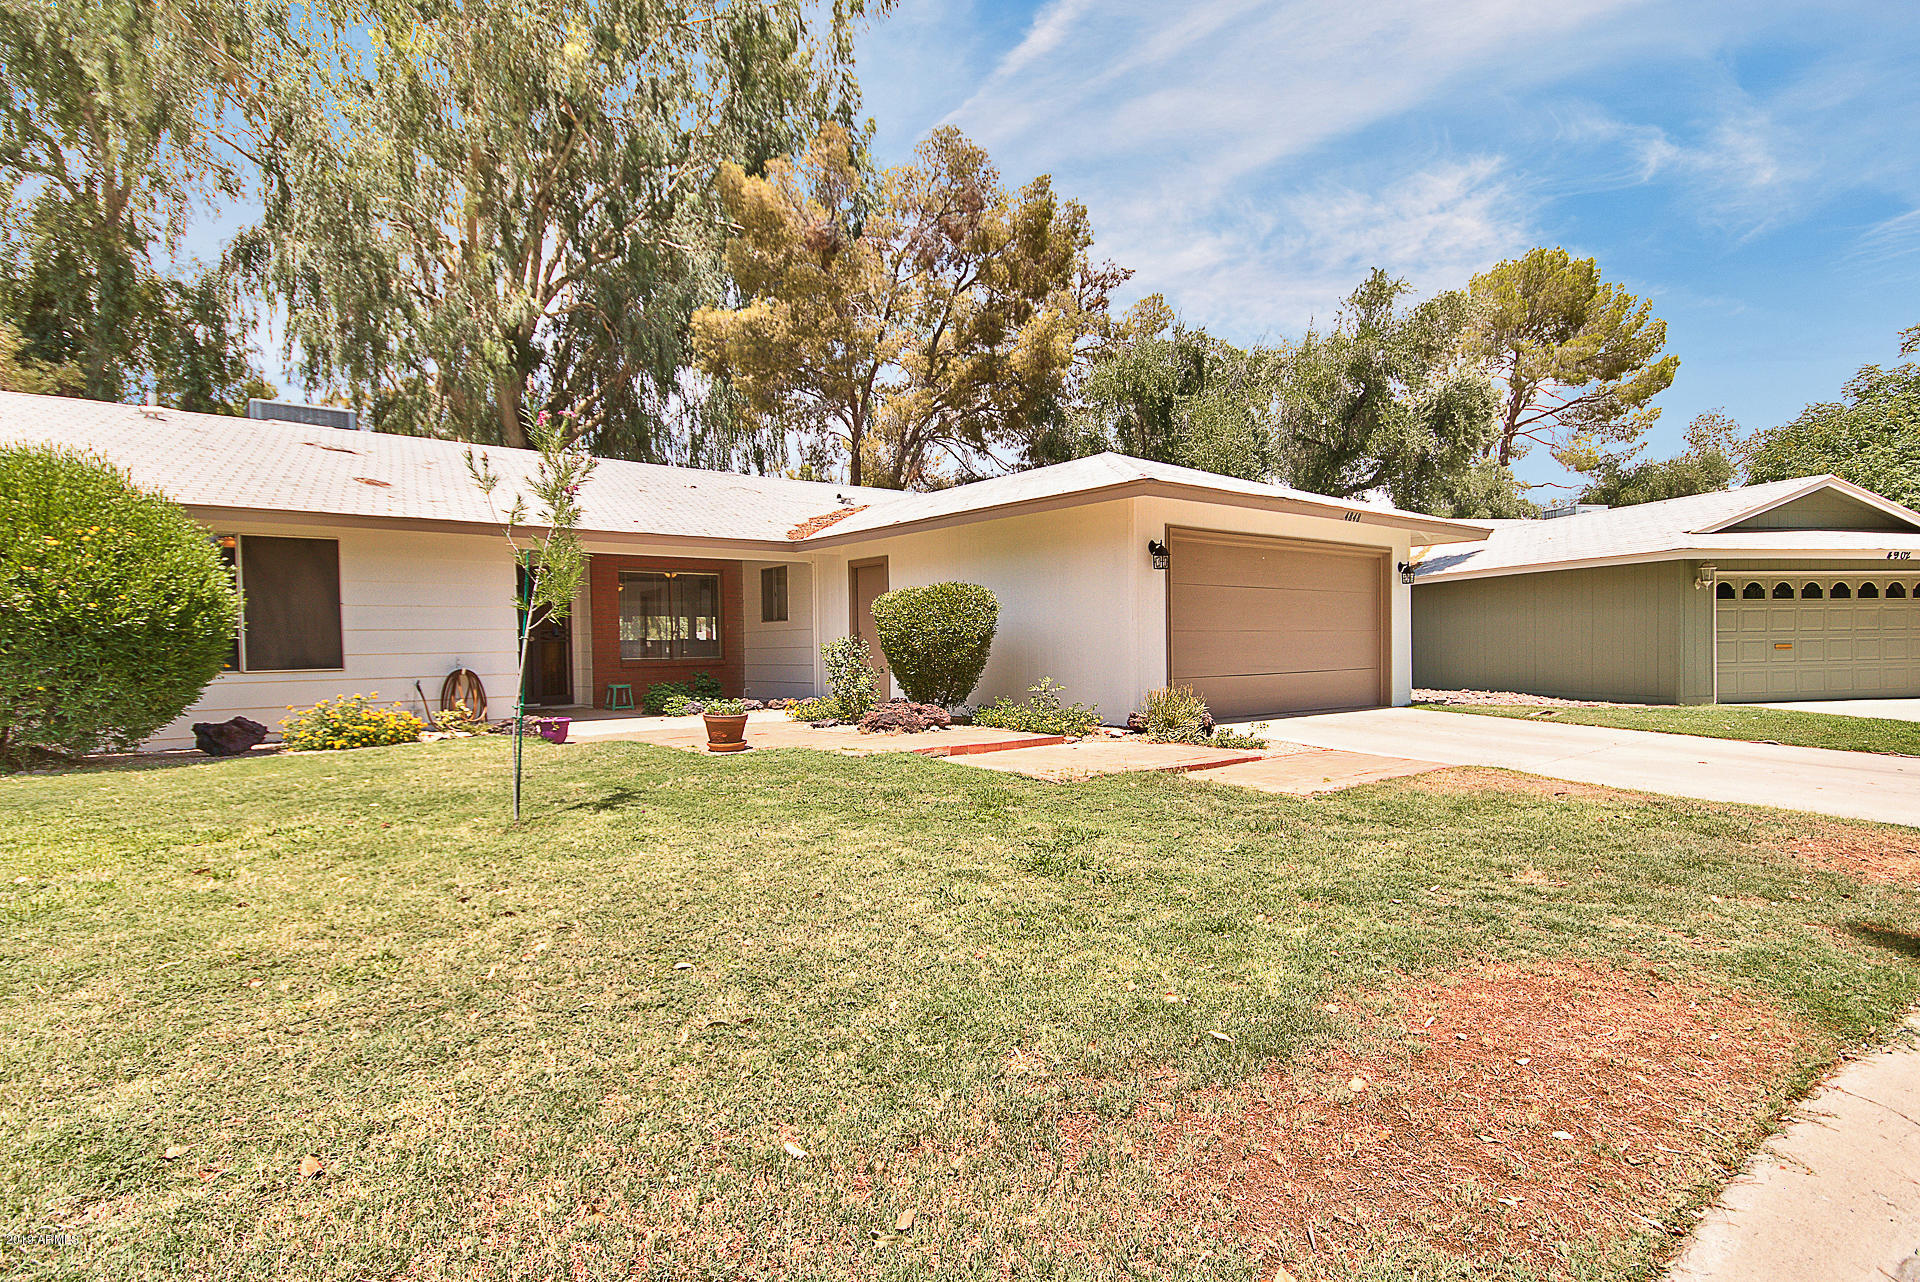 Photo of 4848 E LAKE POINT Circle, Phoenix, AZ 85044